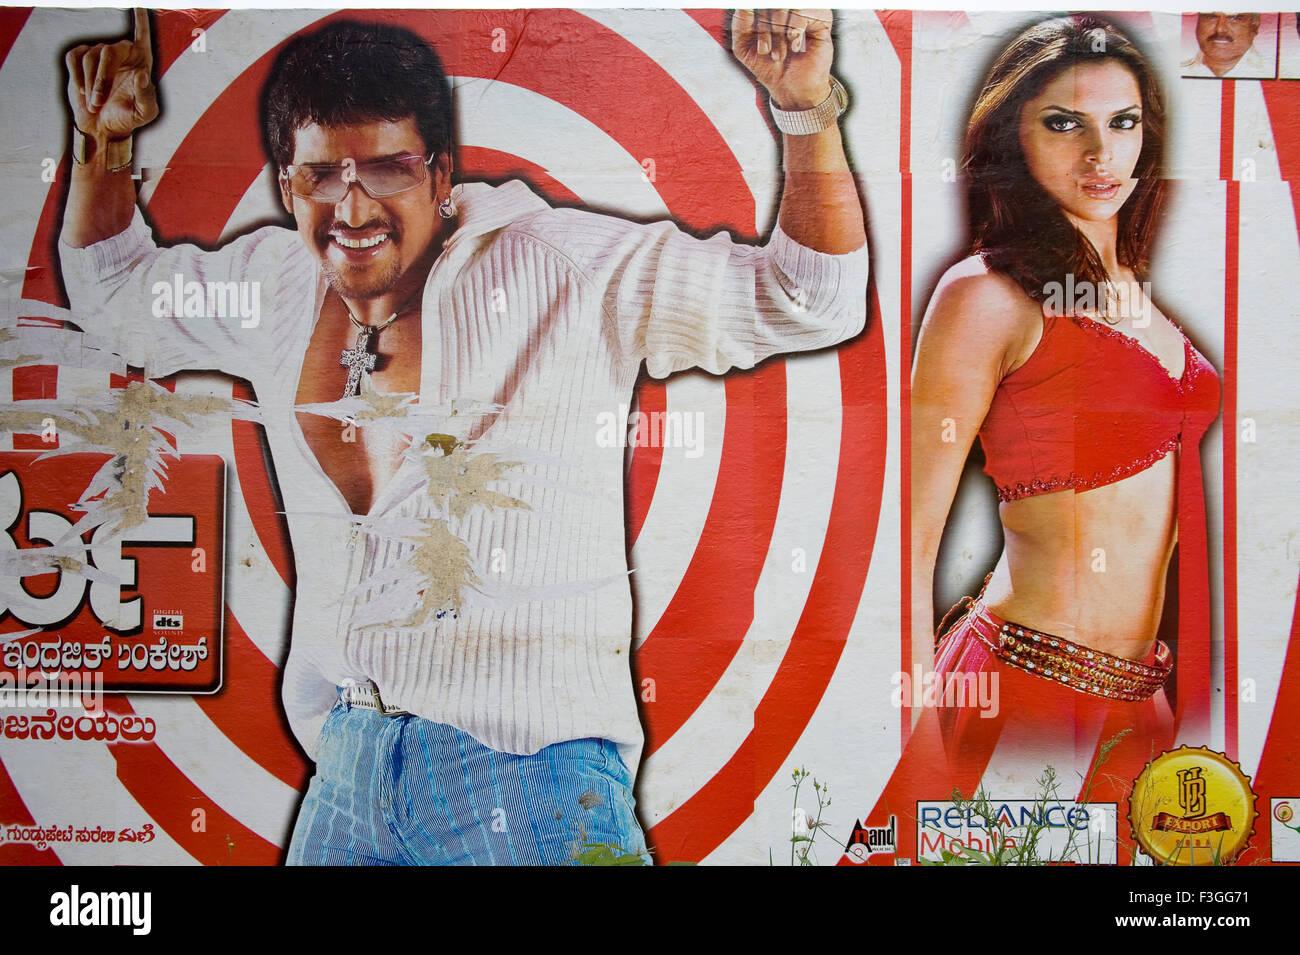 Wall poster of the Kannada Language film ; M G Road ; Bangalore ; Karnataka ; India NO MR - Stock Image